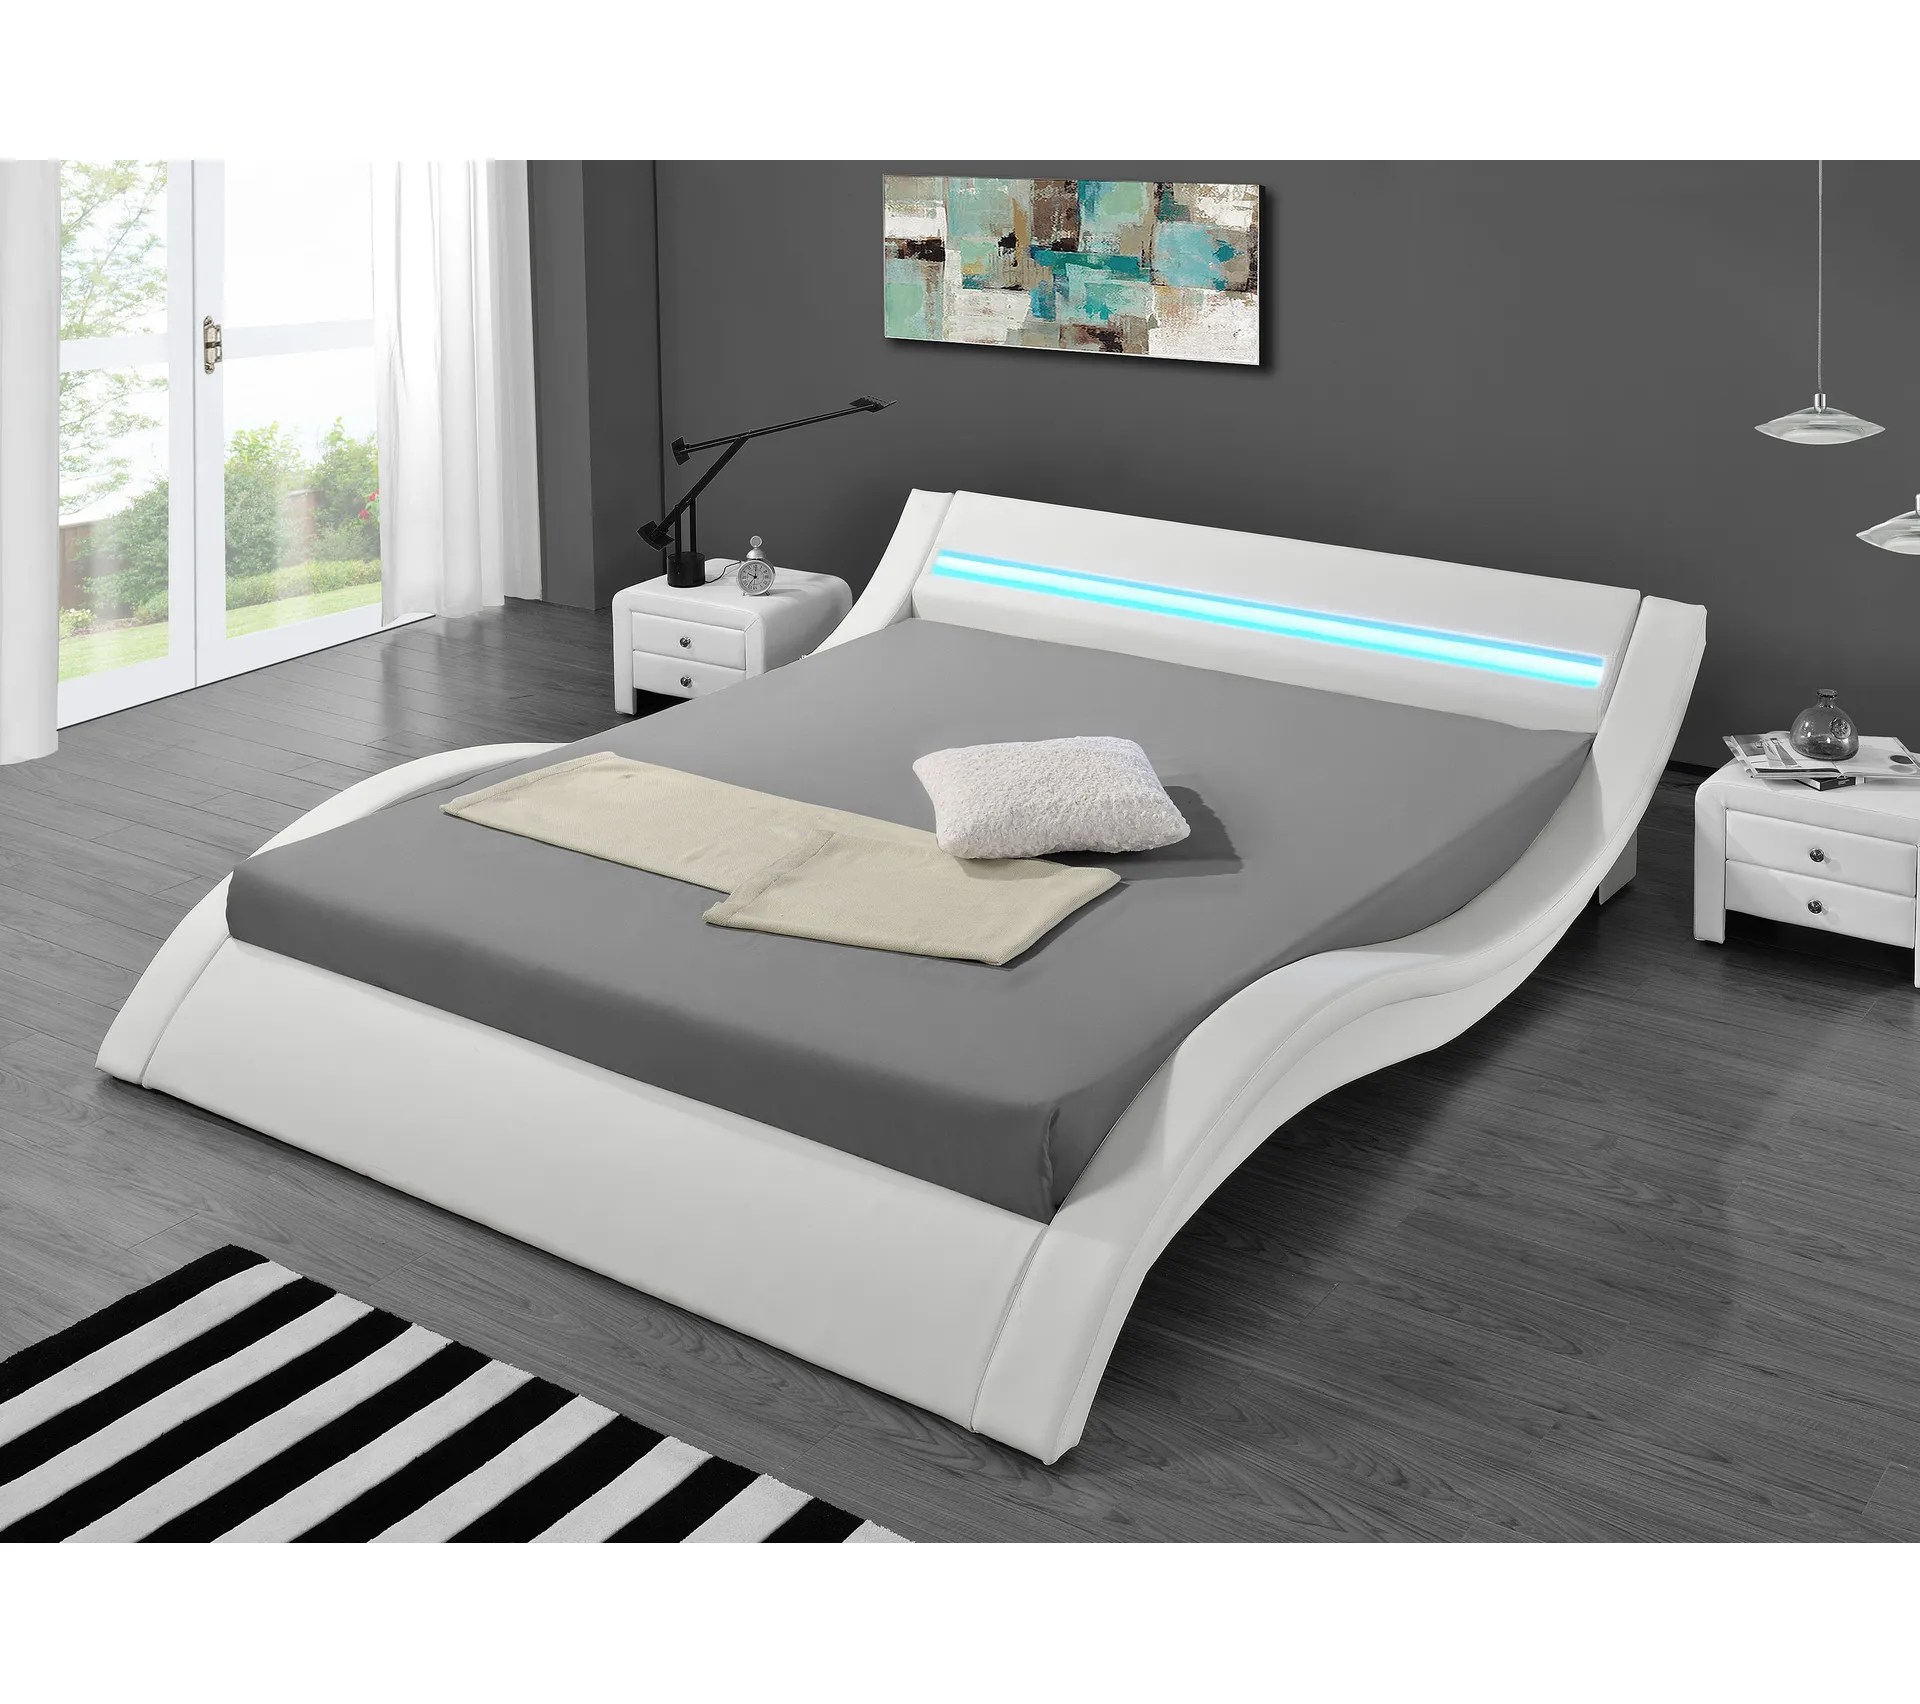 lit design led blanc 180 x 200 cm